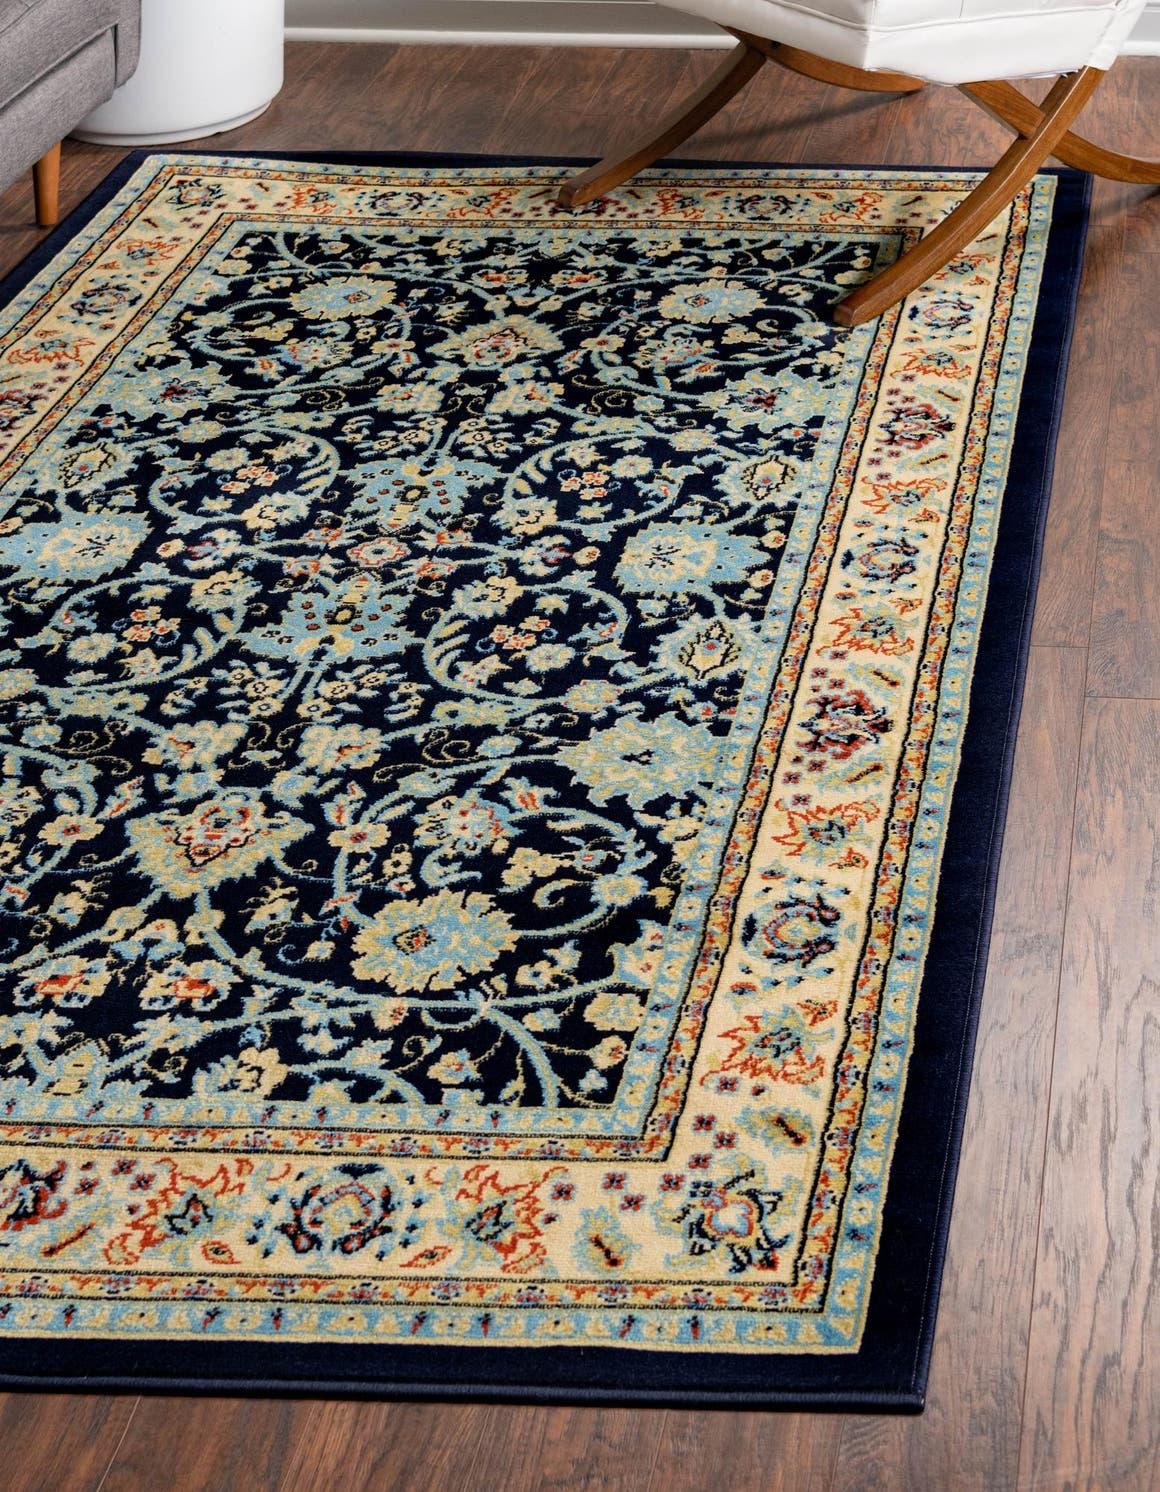 5' x 8' Kashan Design Rug main image